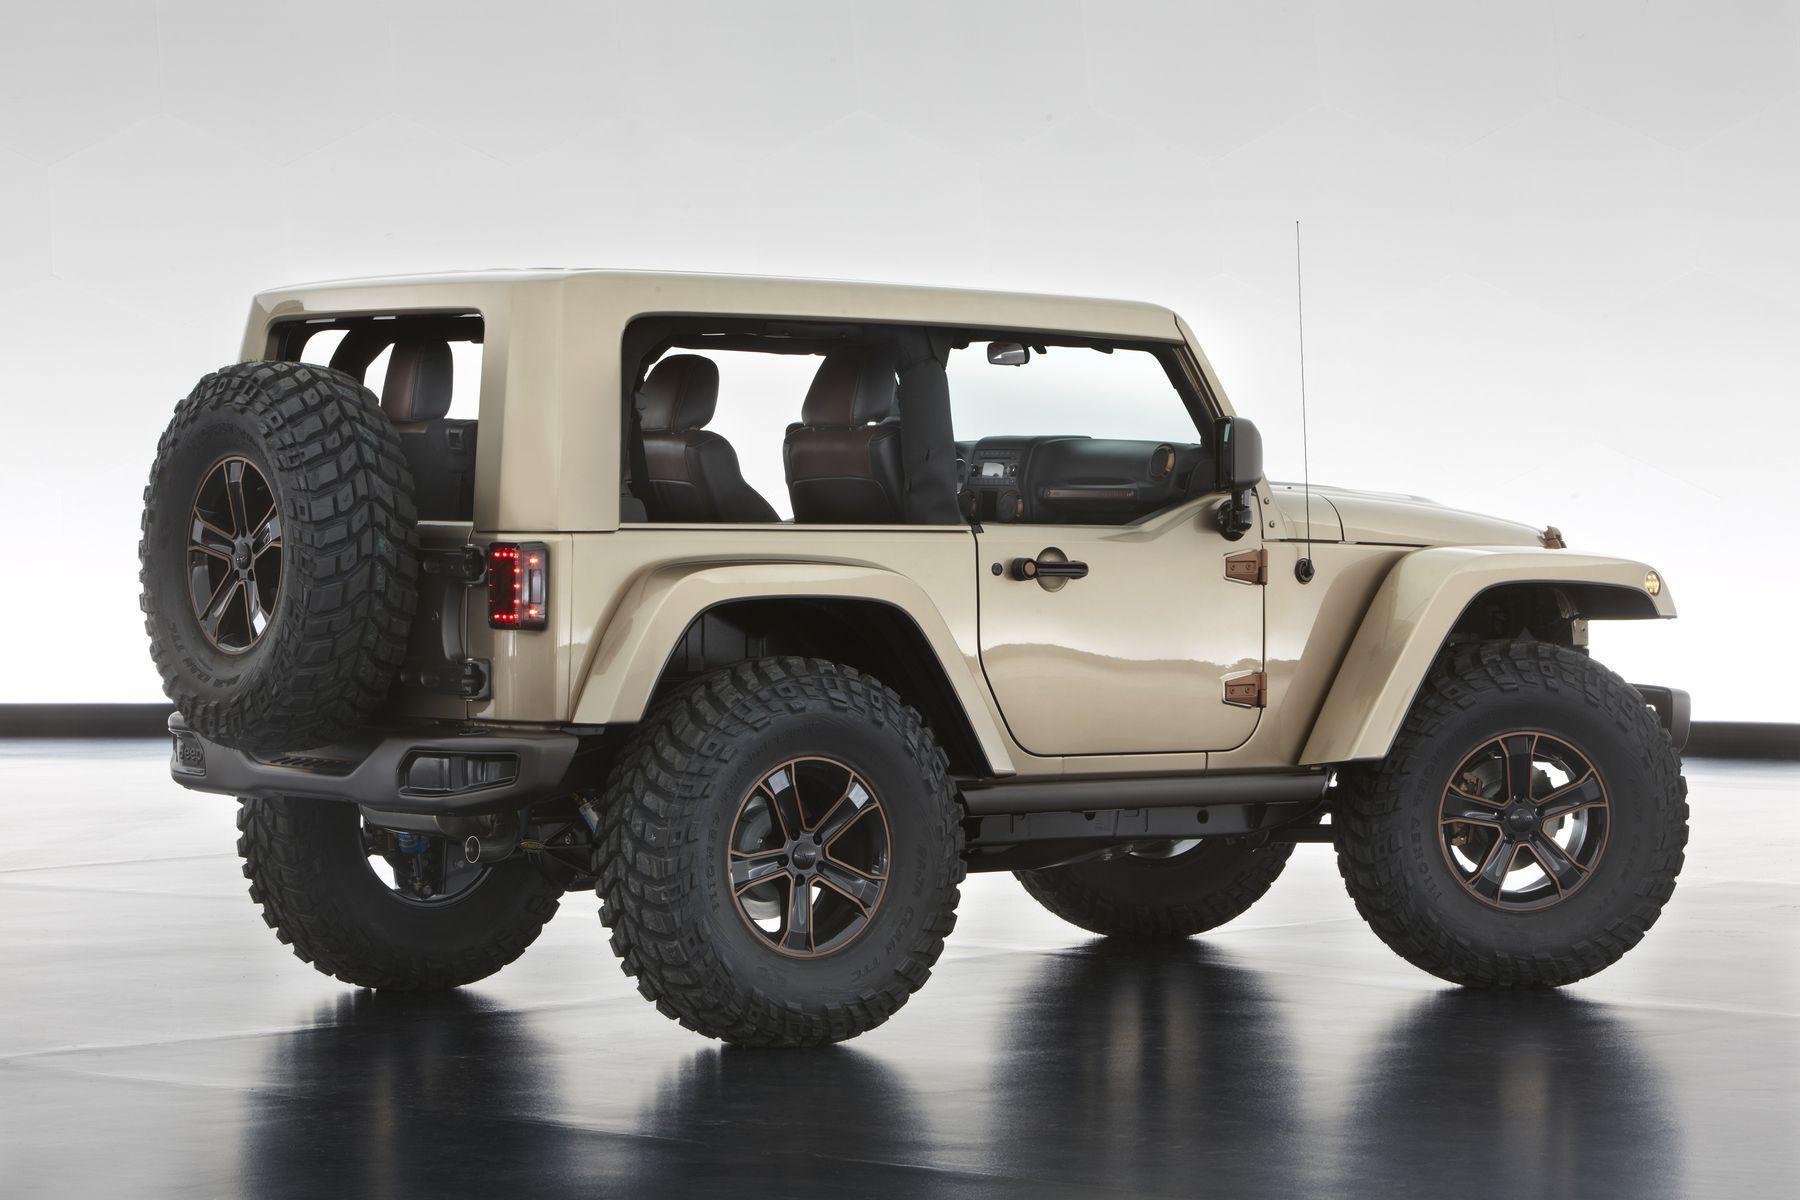 2014 Jeep Wrangler | Mopar Jeep